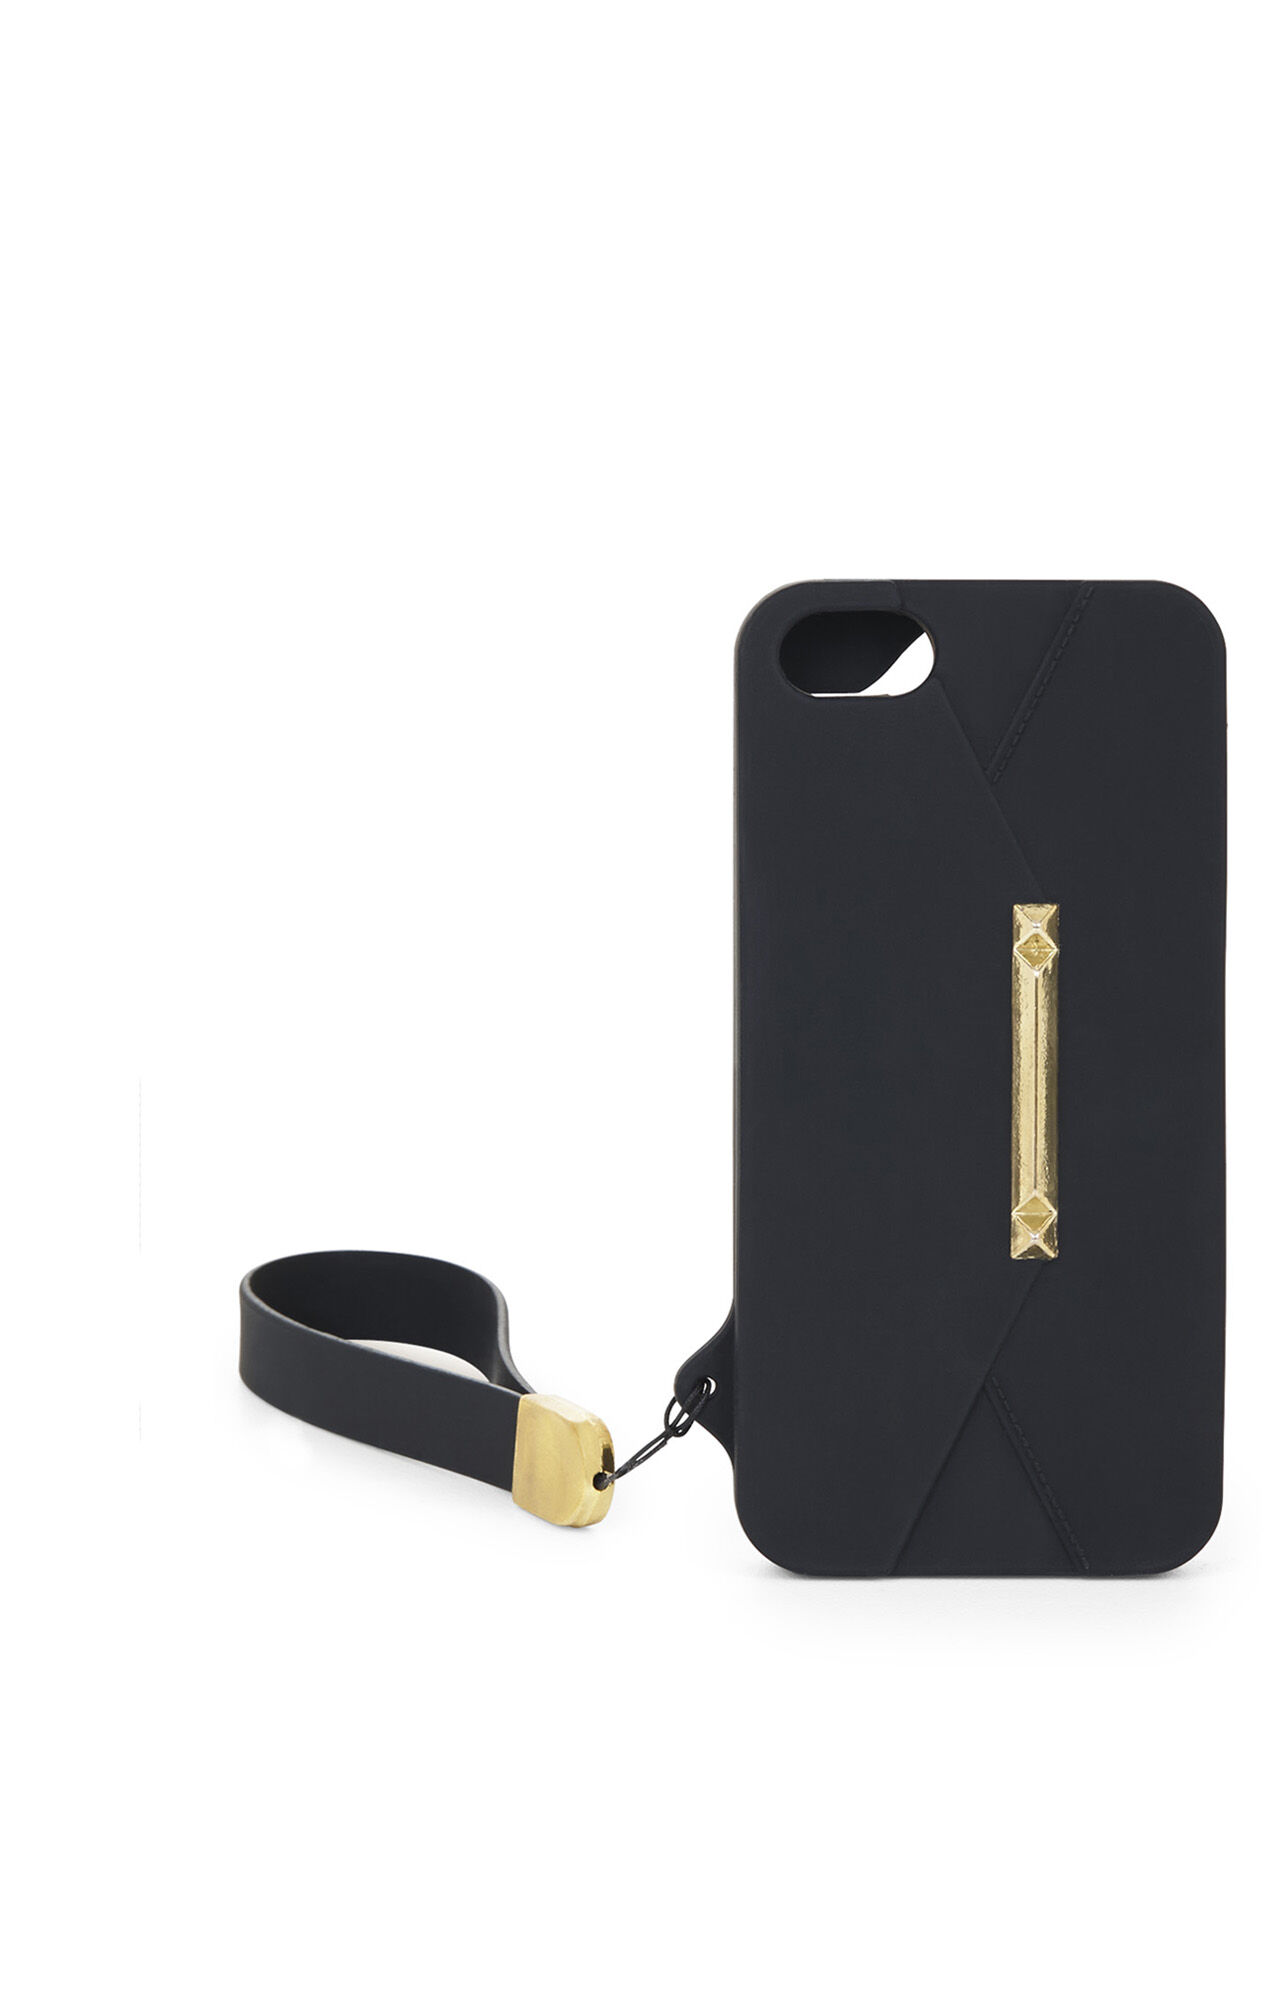 Envelope Clutch iPhone 5 Case